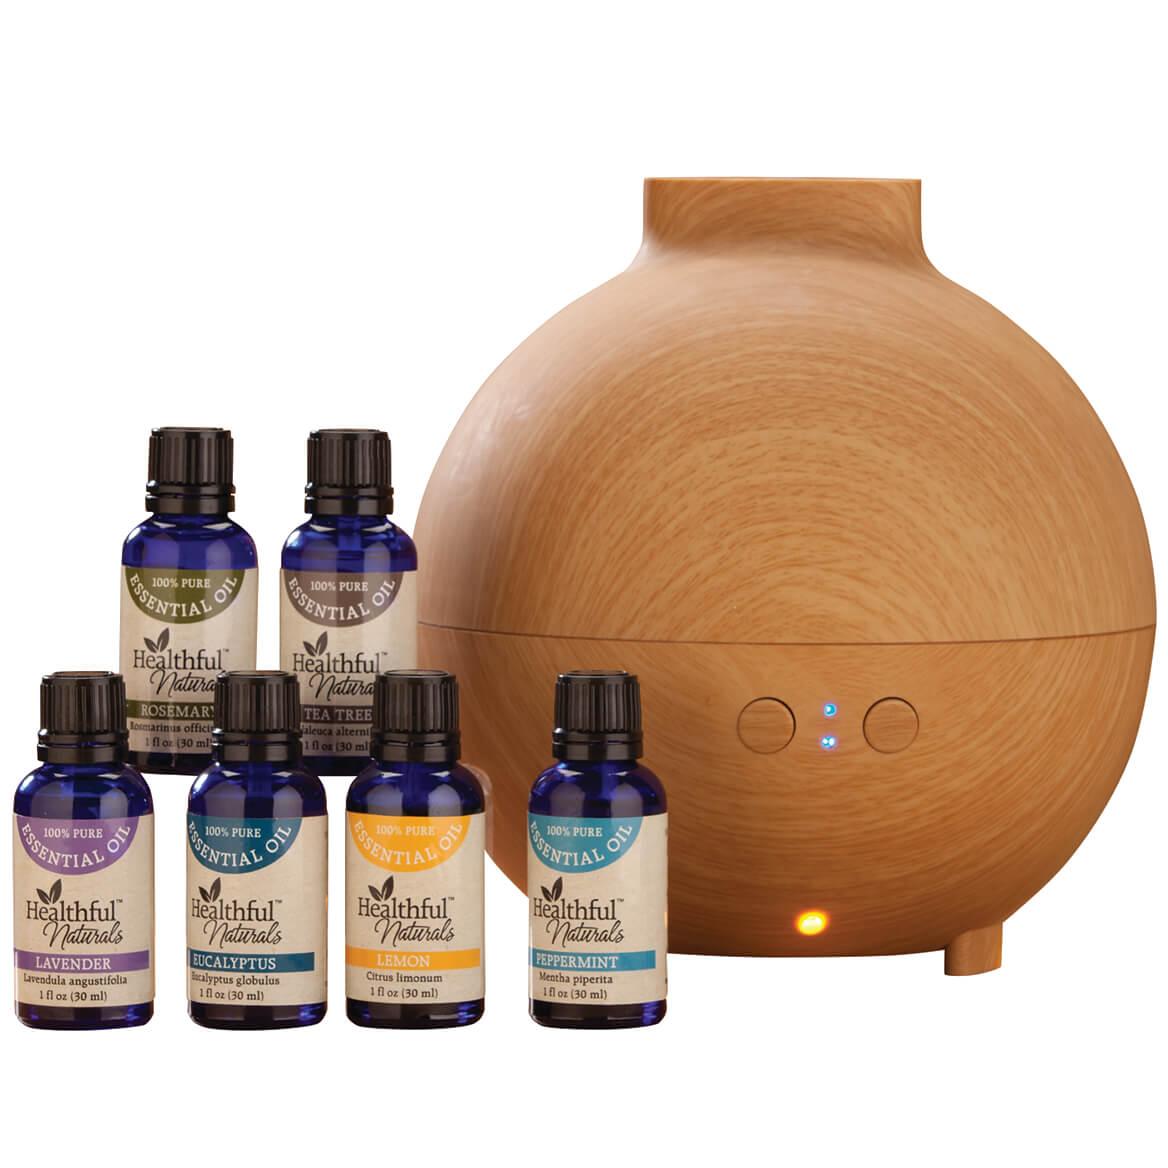 Healthful™ Naturals Starter Kit & 600 ml Diffuser-356535